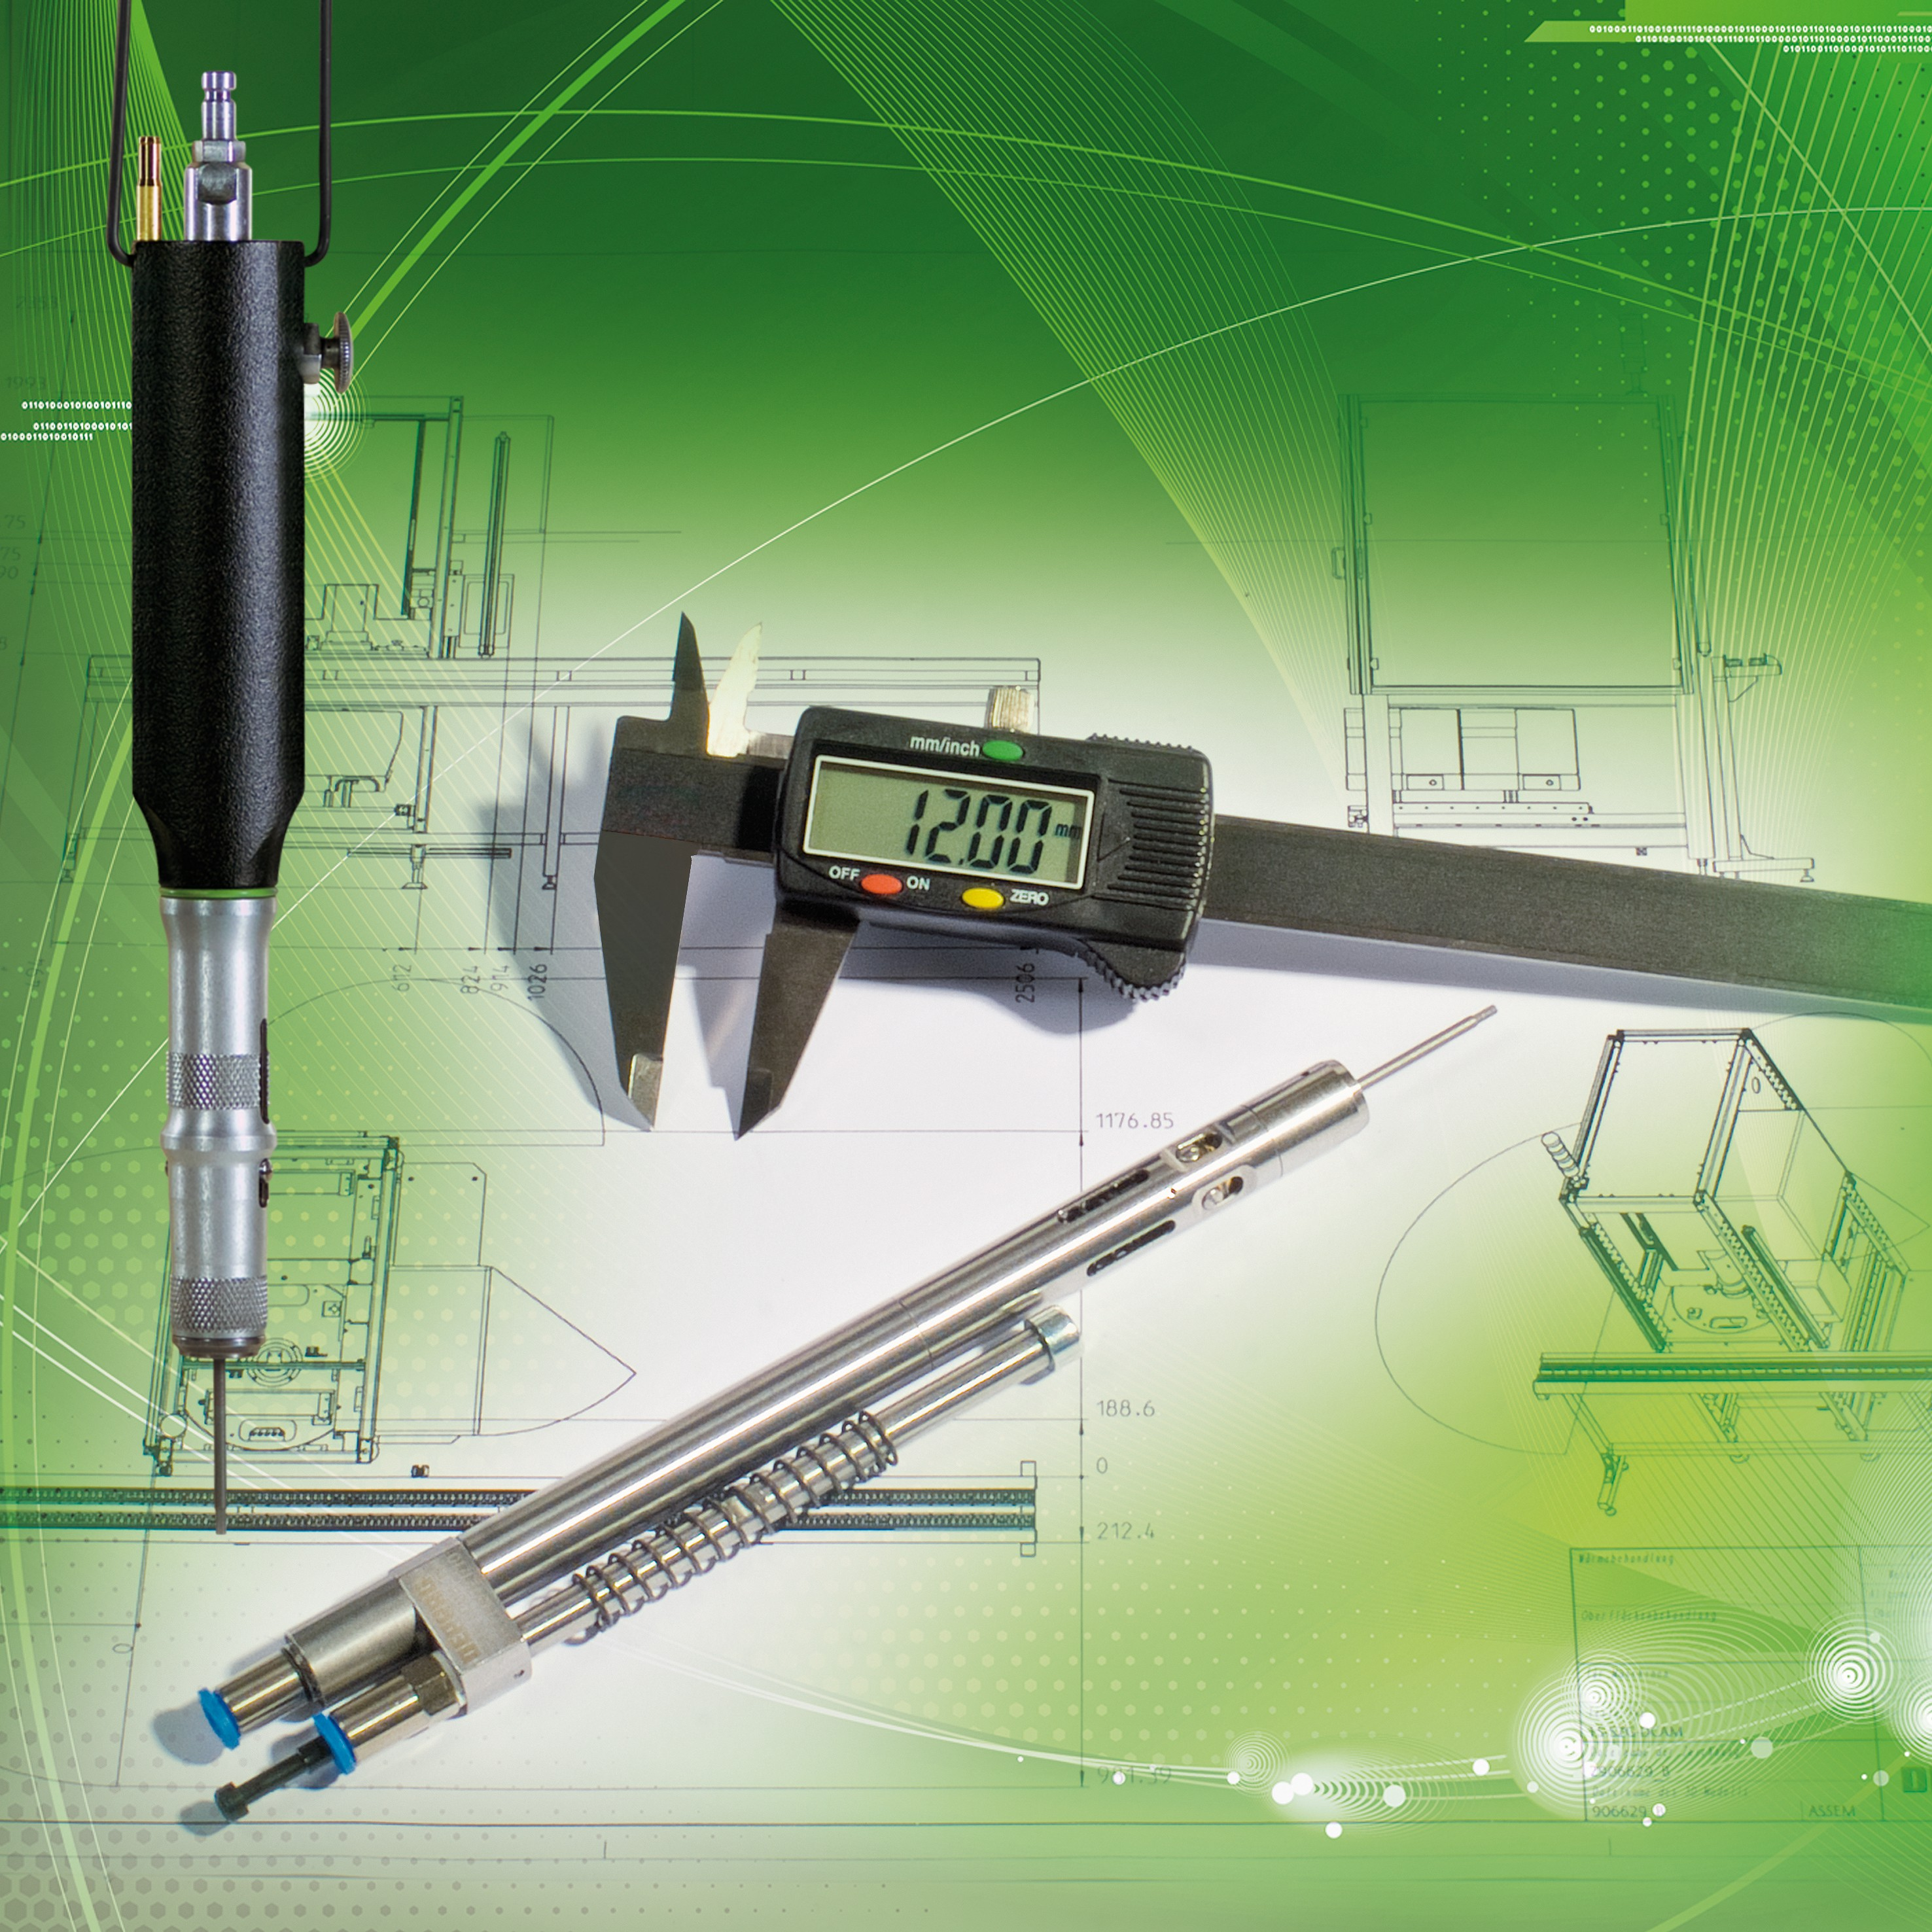 Minimum Gmbh screwdriver applies minimum torque deprag schulz gmbh u co